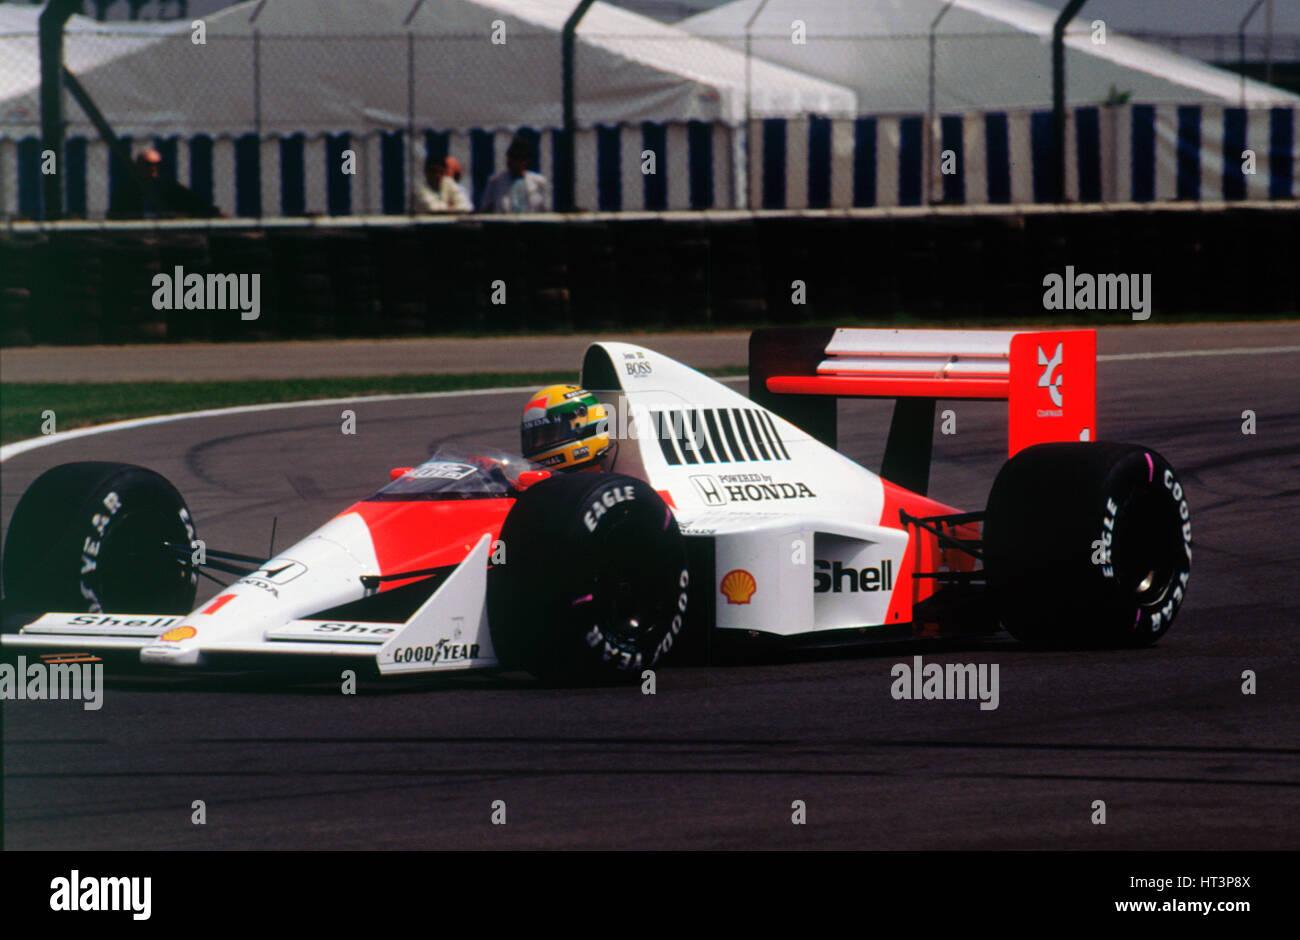 Ayrton Senna in the McLaren MP4-5 at 1989 British Grand Prix, Silverstone Artist: Unknown. Stock Photo